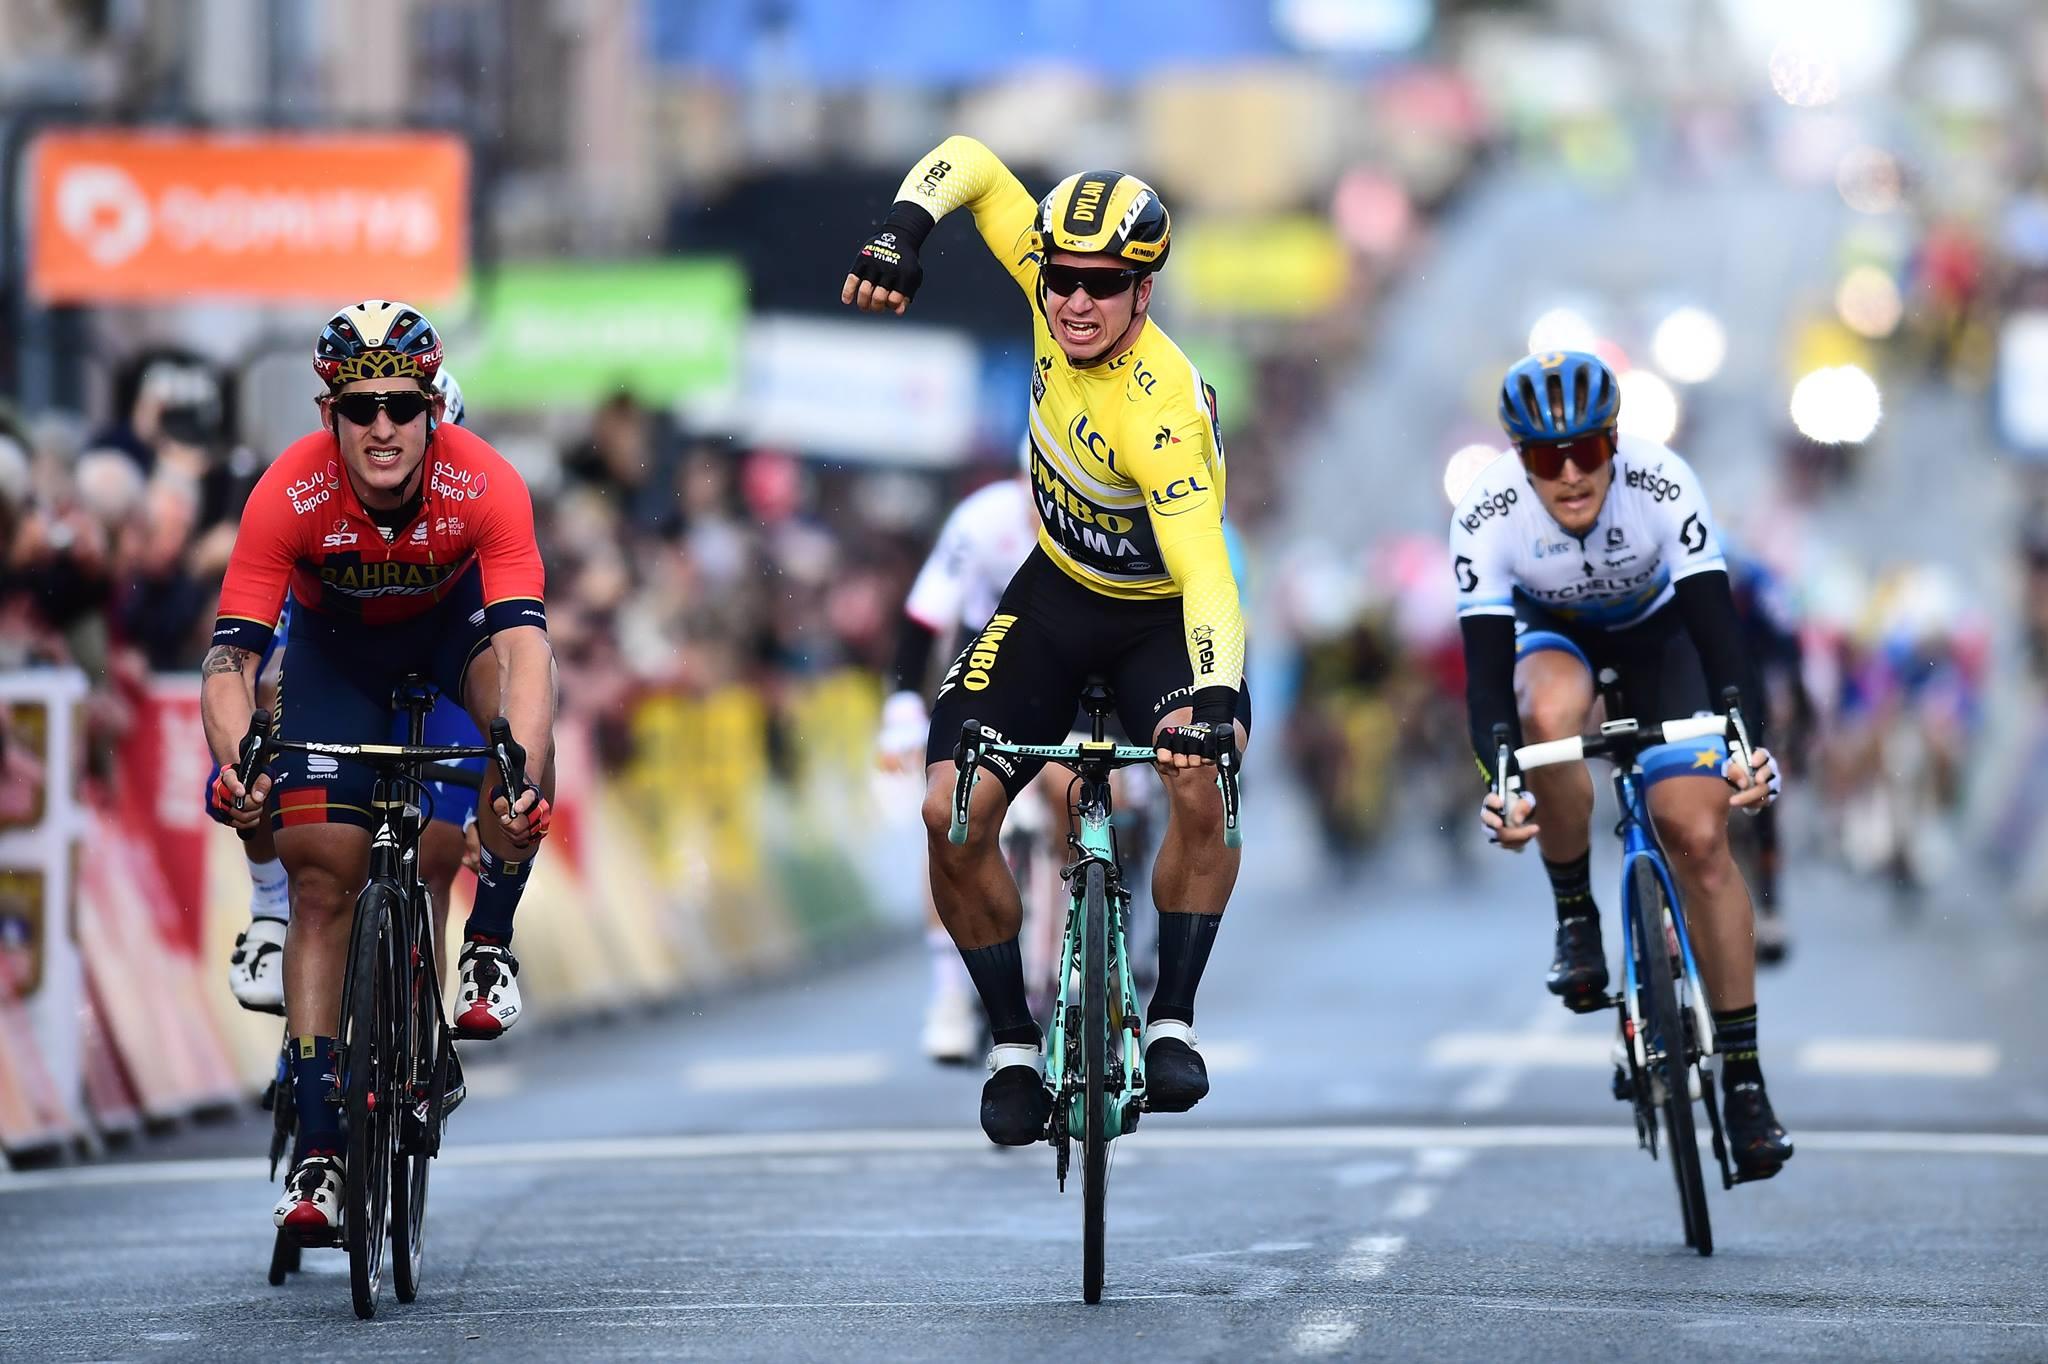 Dylan Groenewegen vince la seconda tappa della Parigi-Nizza